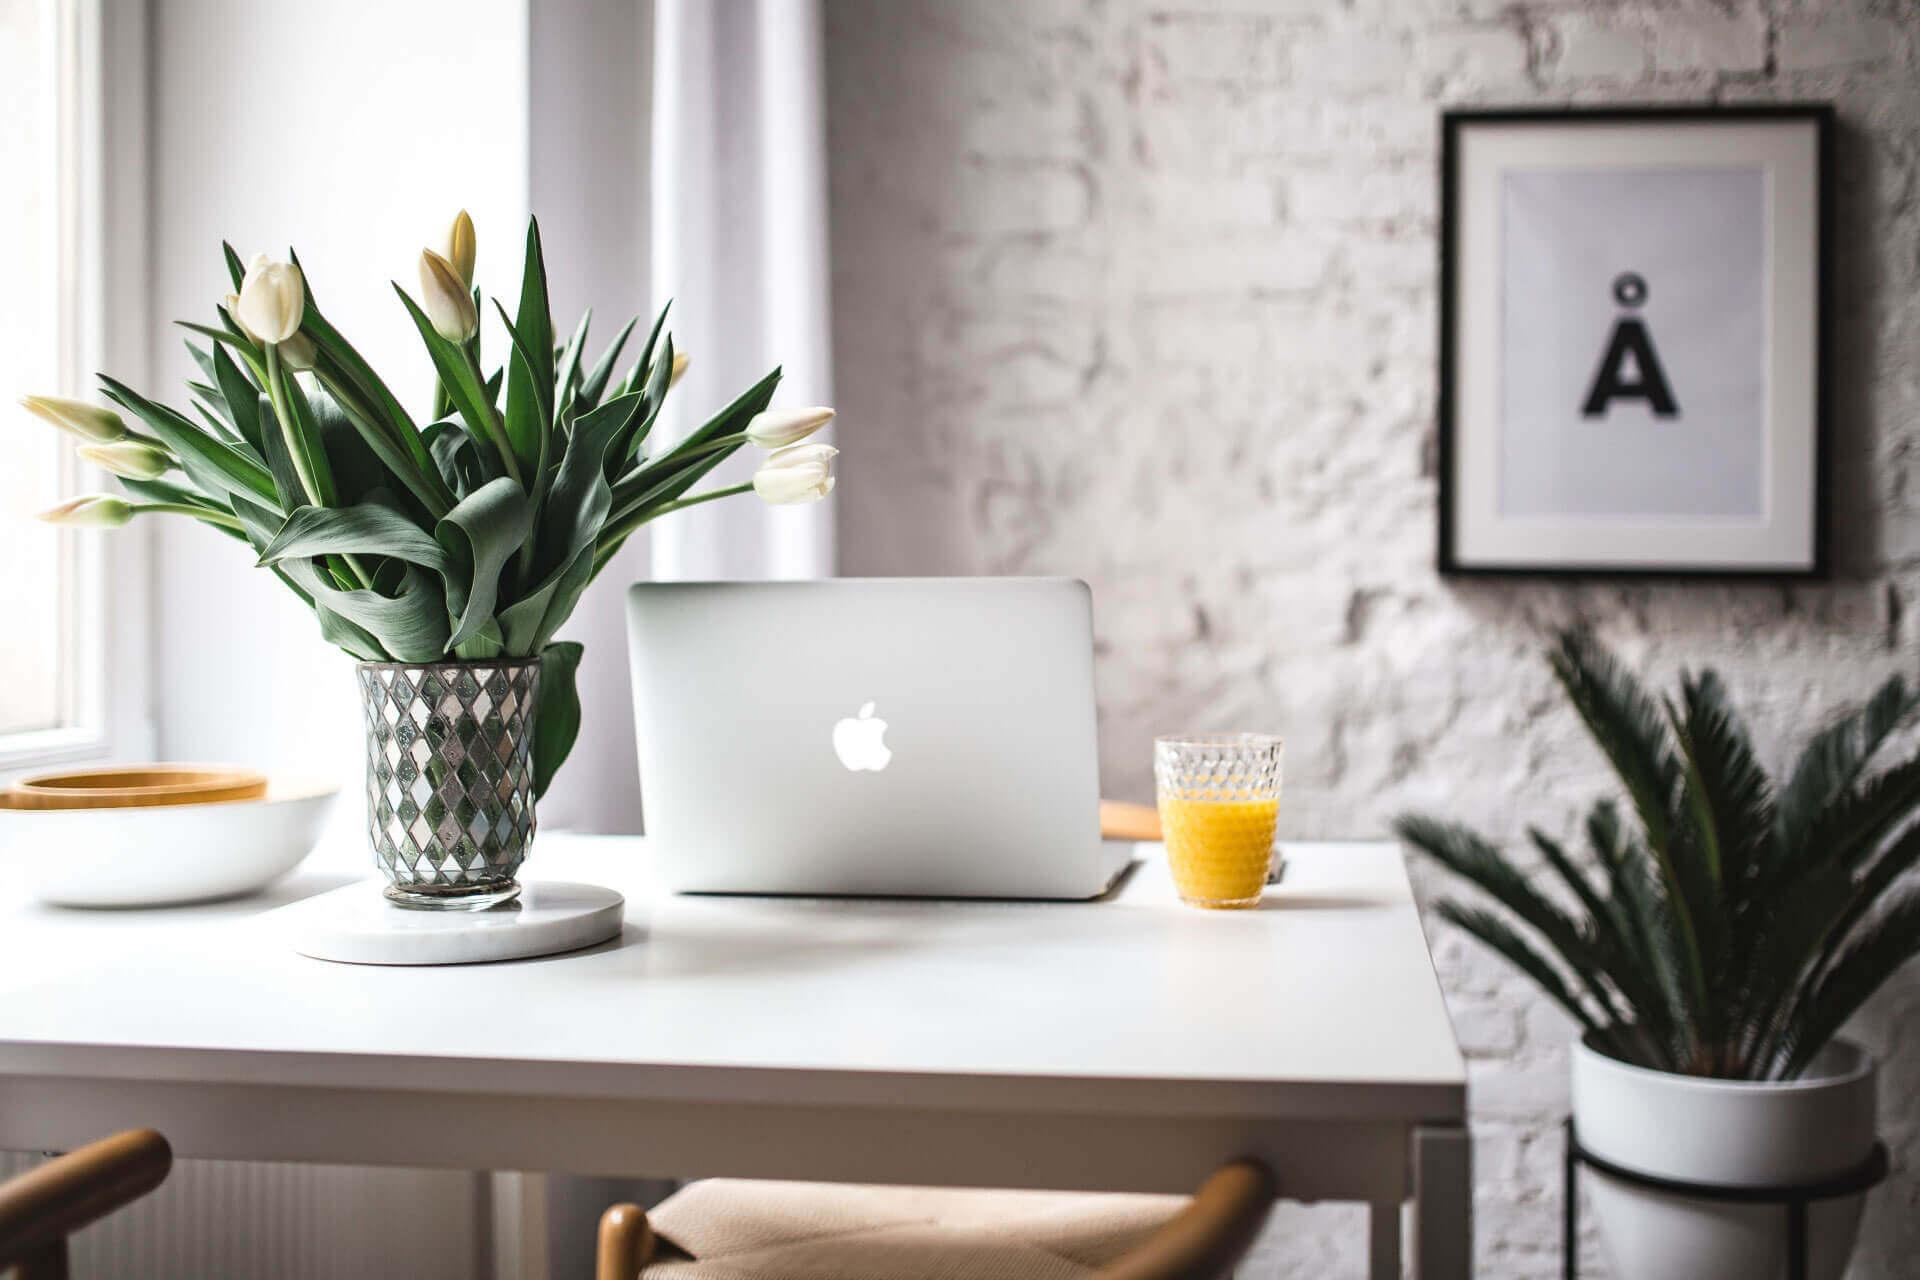 Flex Your Digital Website Care